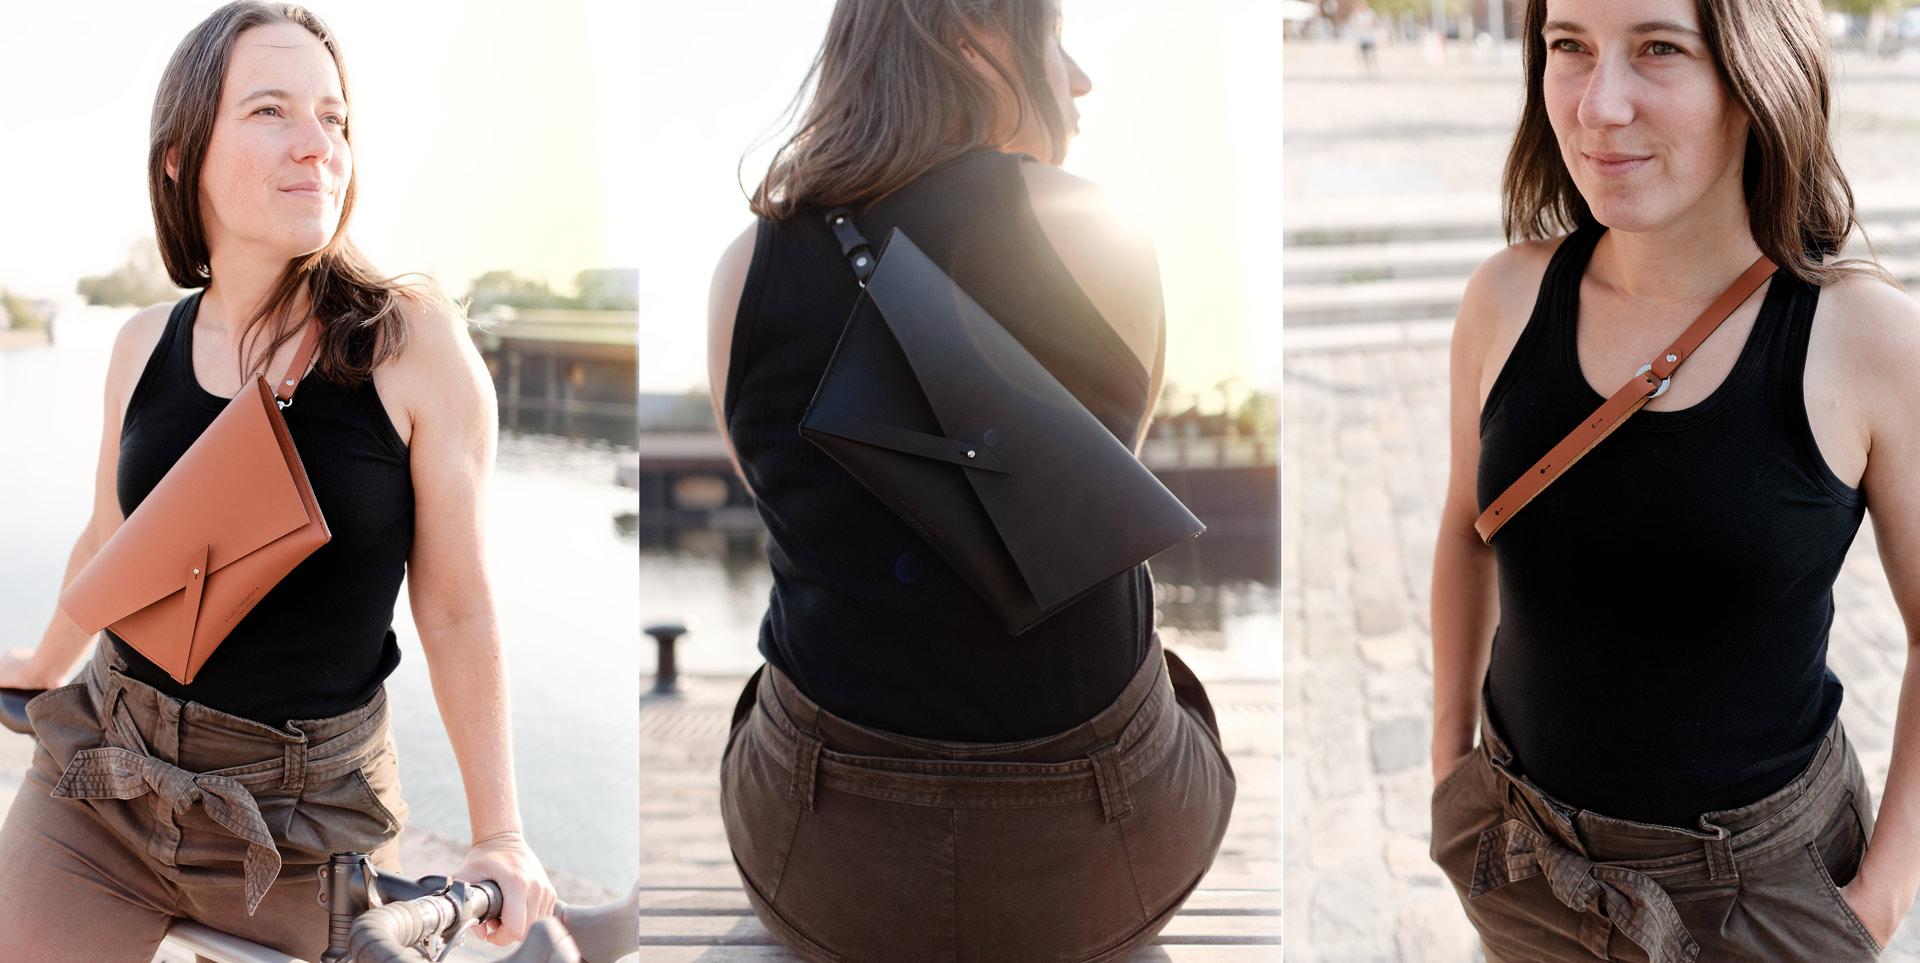 Sac Banane Lady Harberton sac en cuir minimaliste fabriqué en France